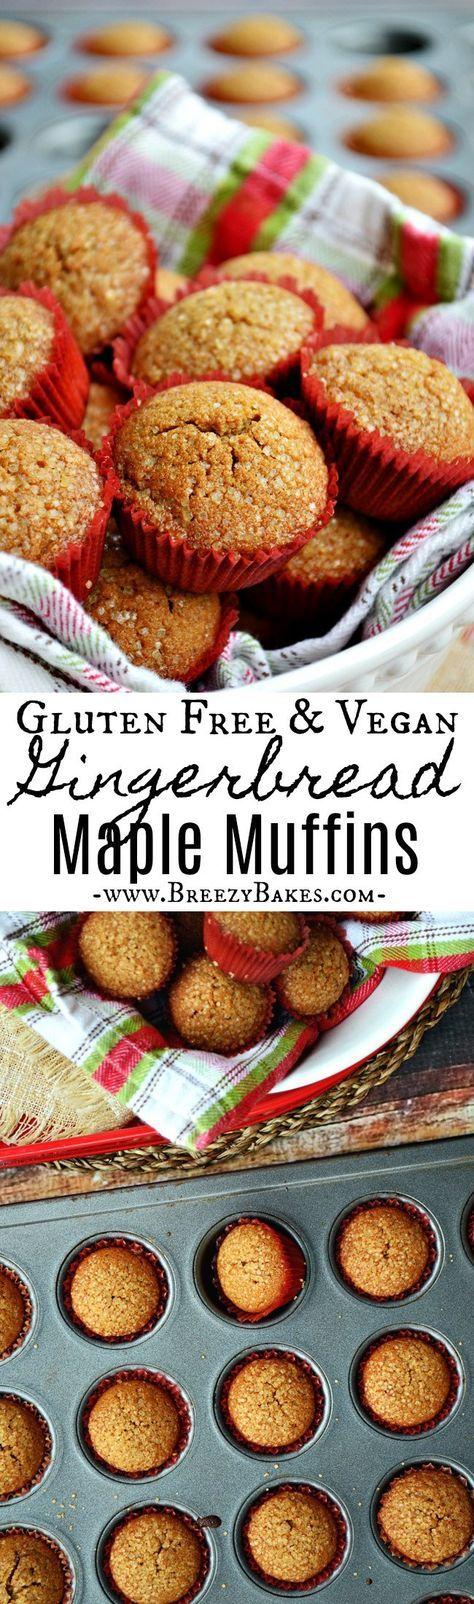 Gluten Free Vegan Gingerbread Muffins